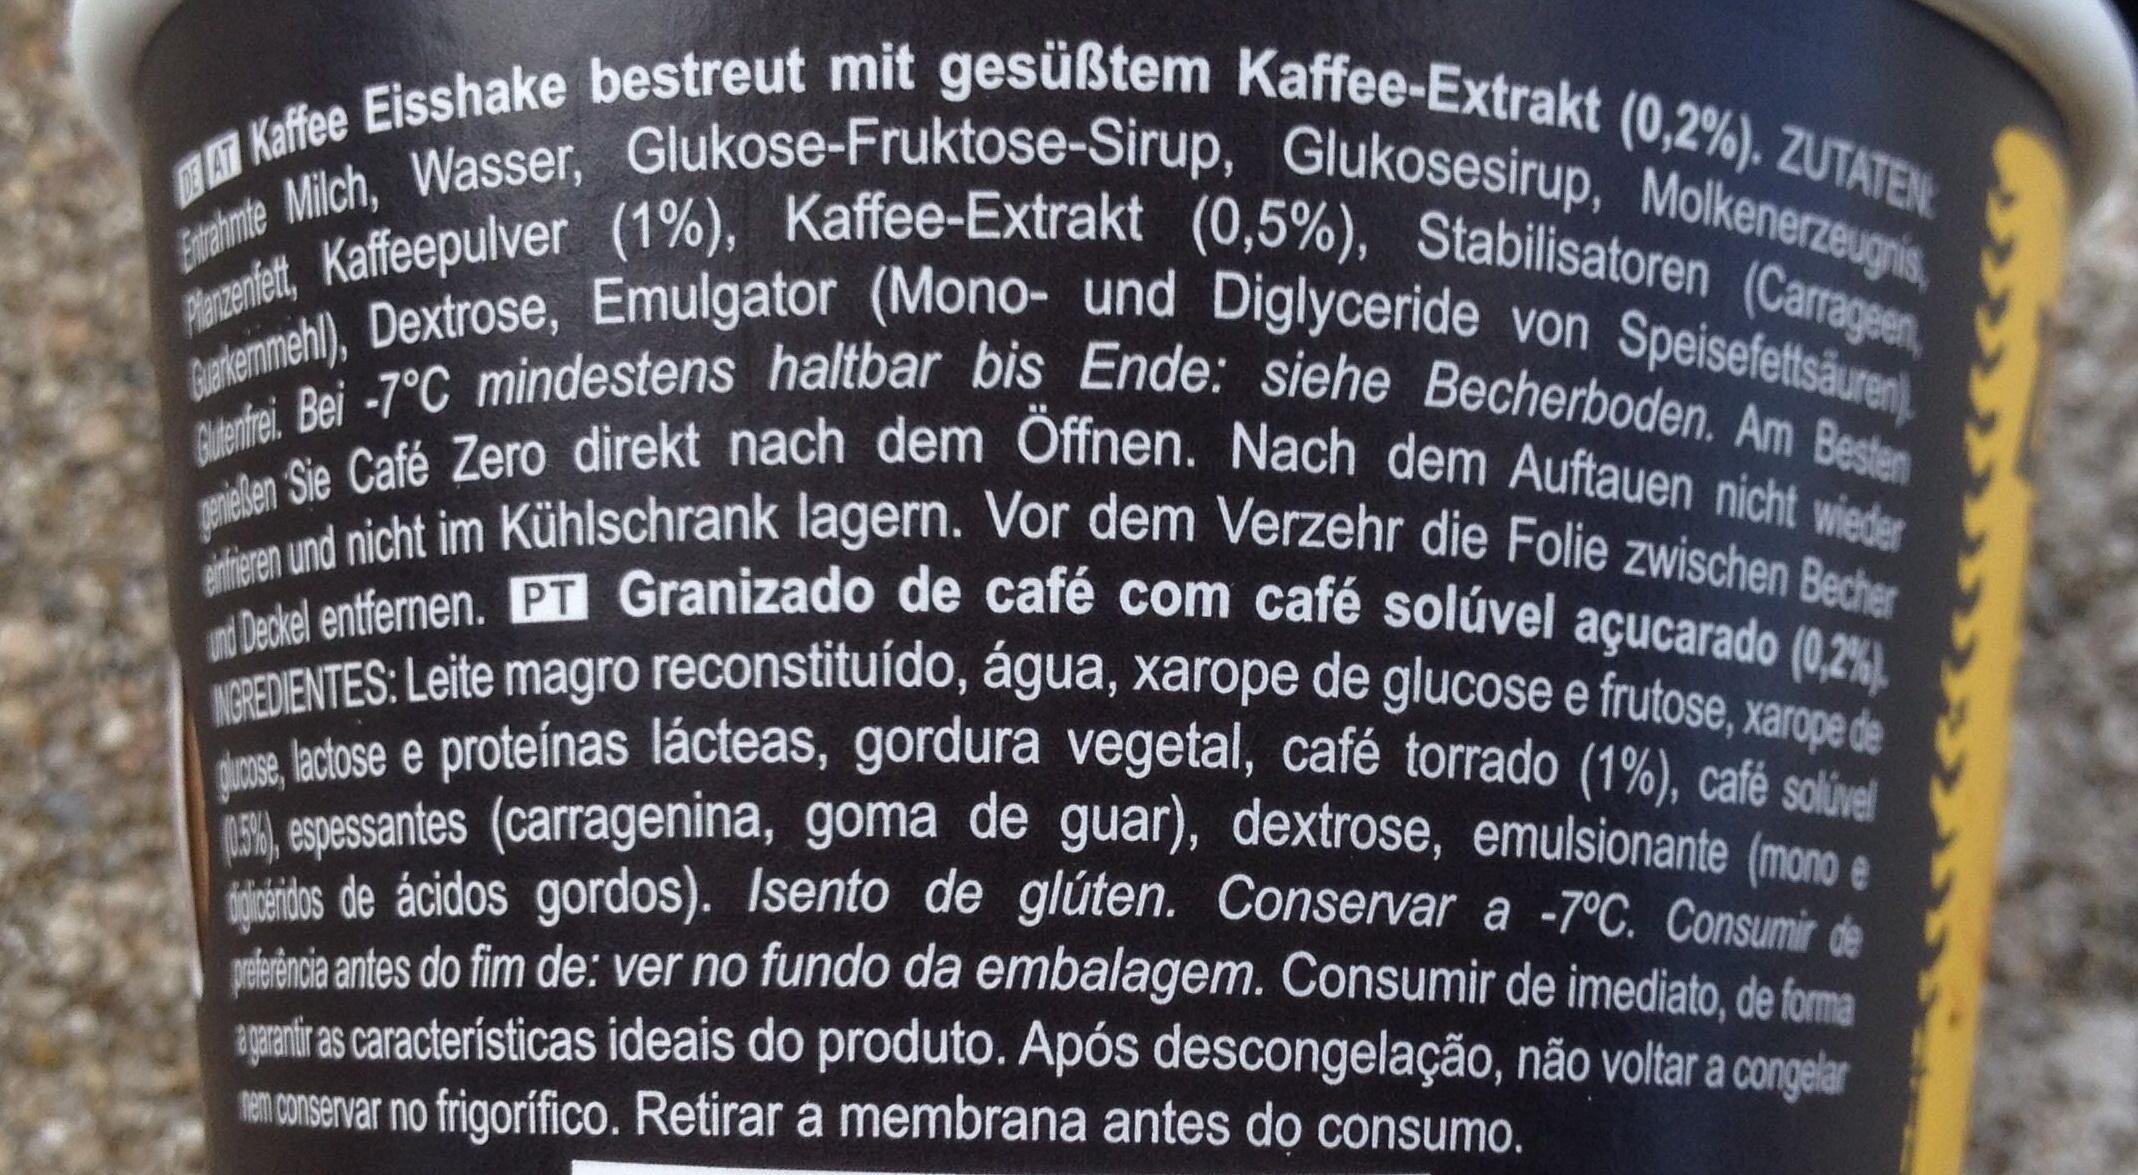 Café Zero° Espresso - Ingredients